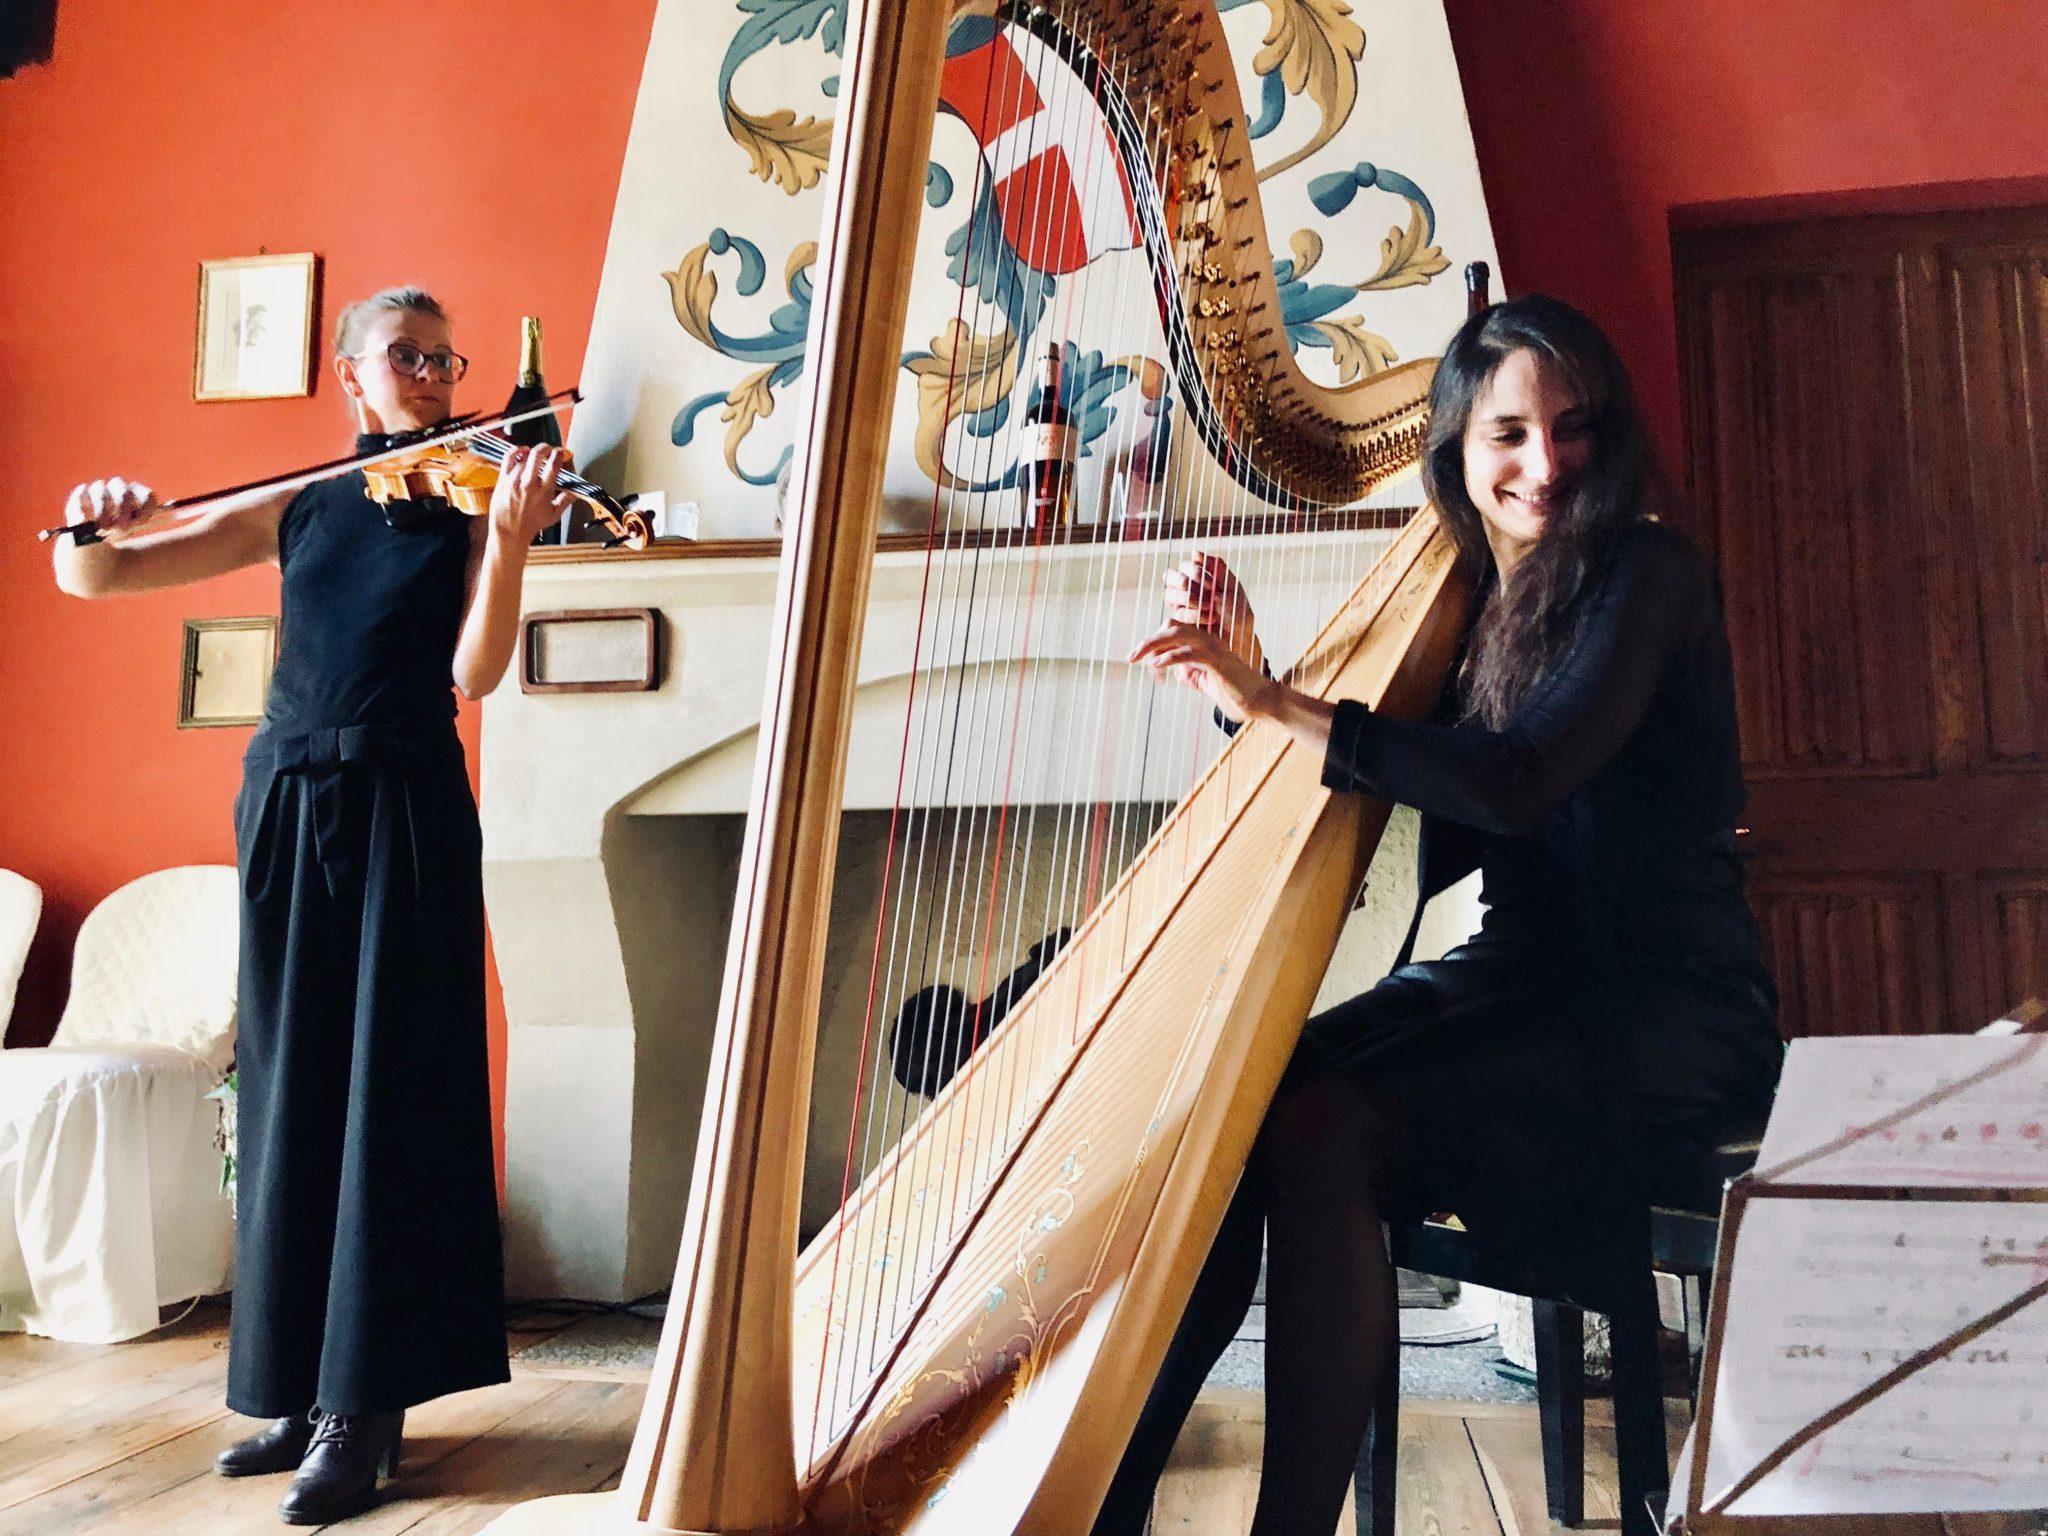 violino arpa cerimonia religiosa